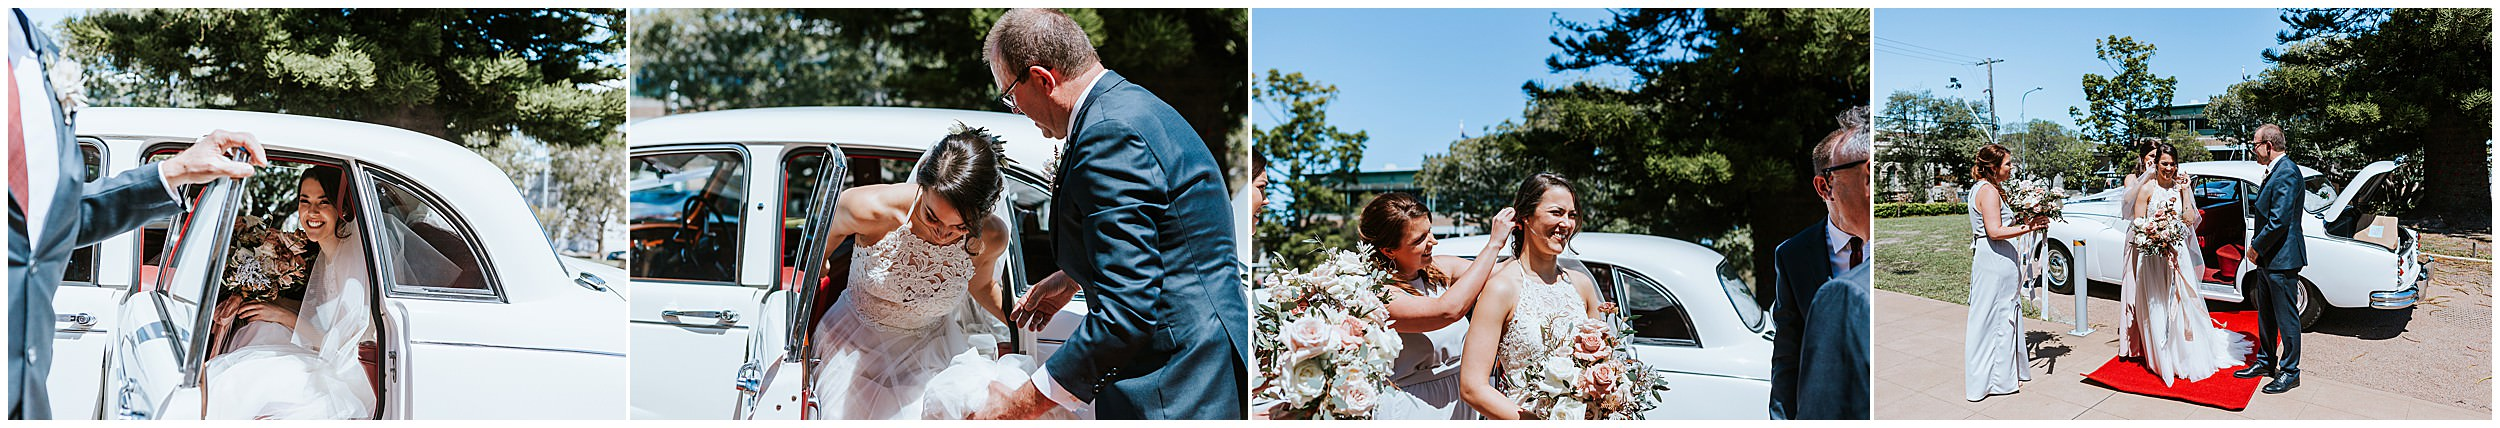 wedding_the_woolshed_steph_zac_0024.jpg